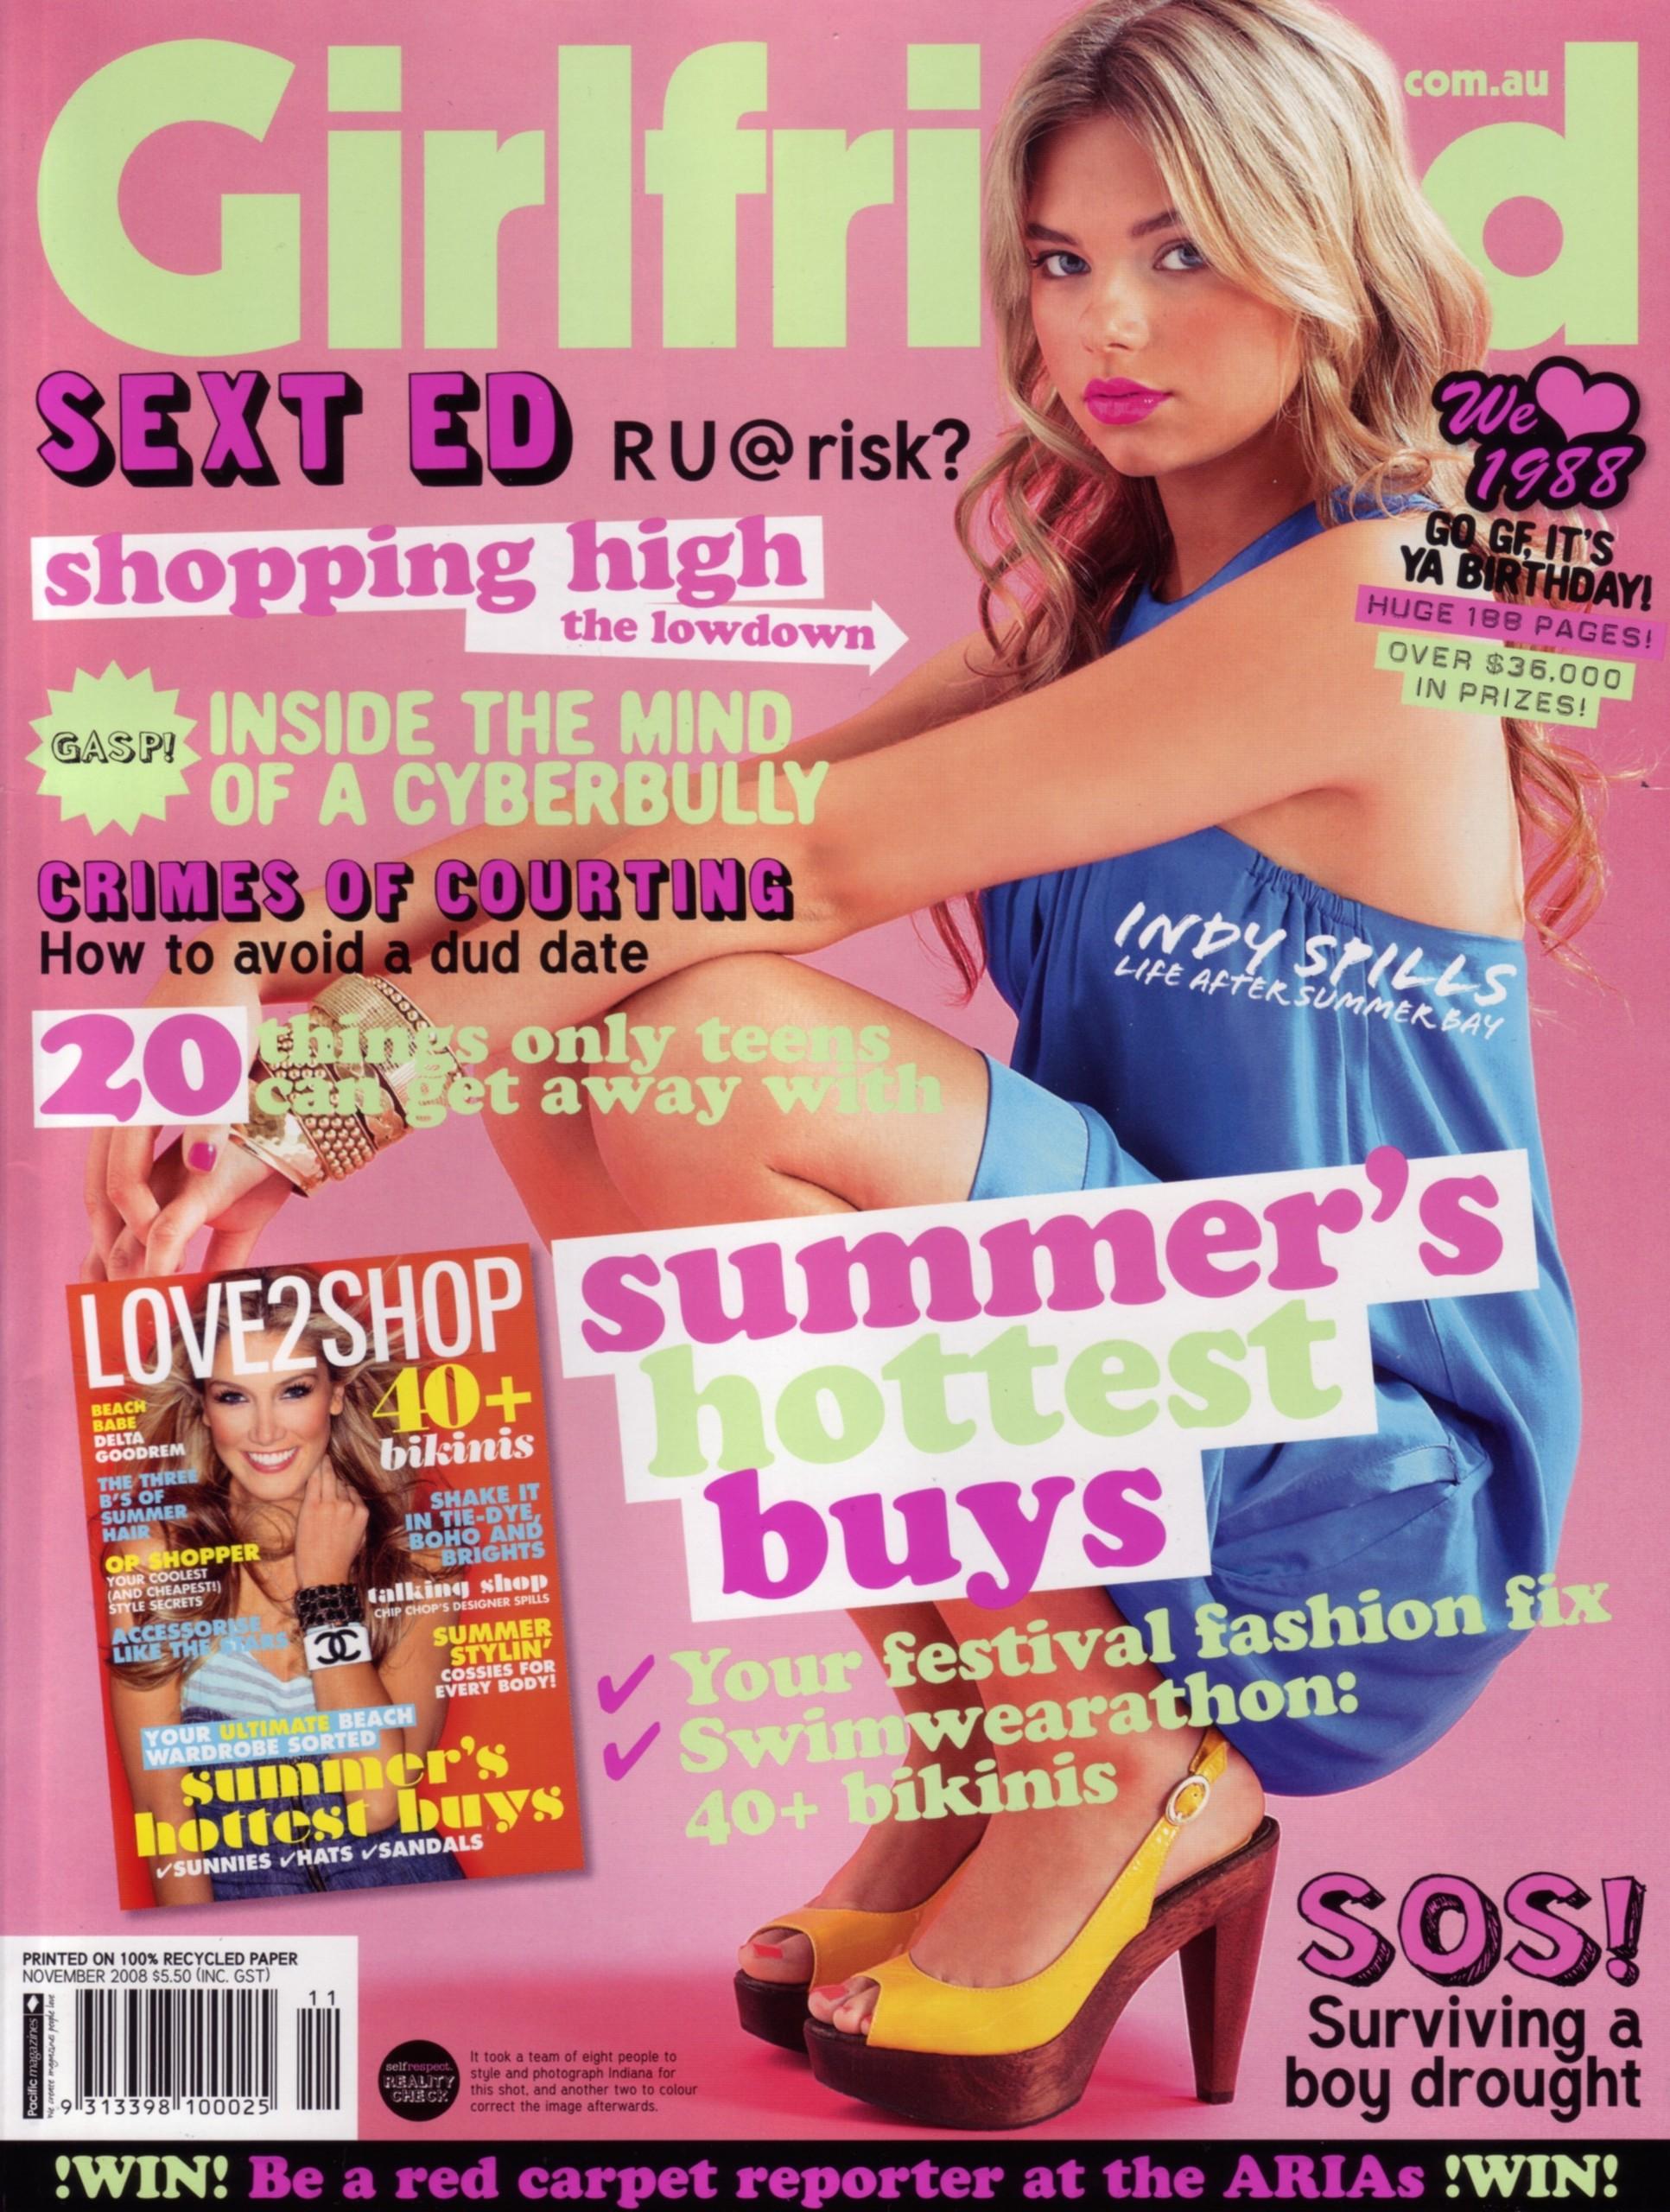 indiana-evans-in-girlfriend-magazine-wallpaper-wp5605887